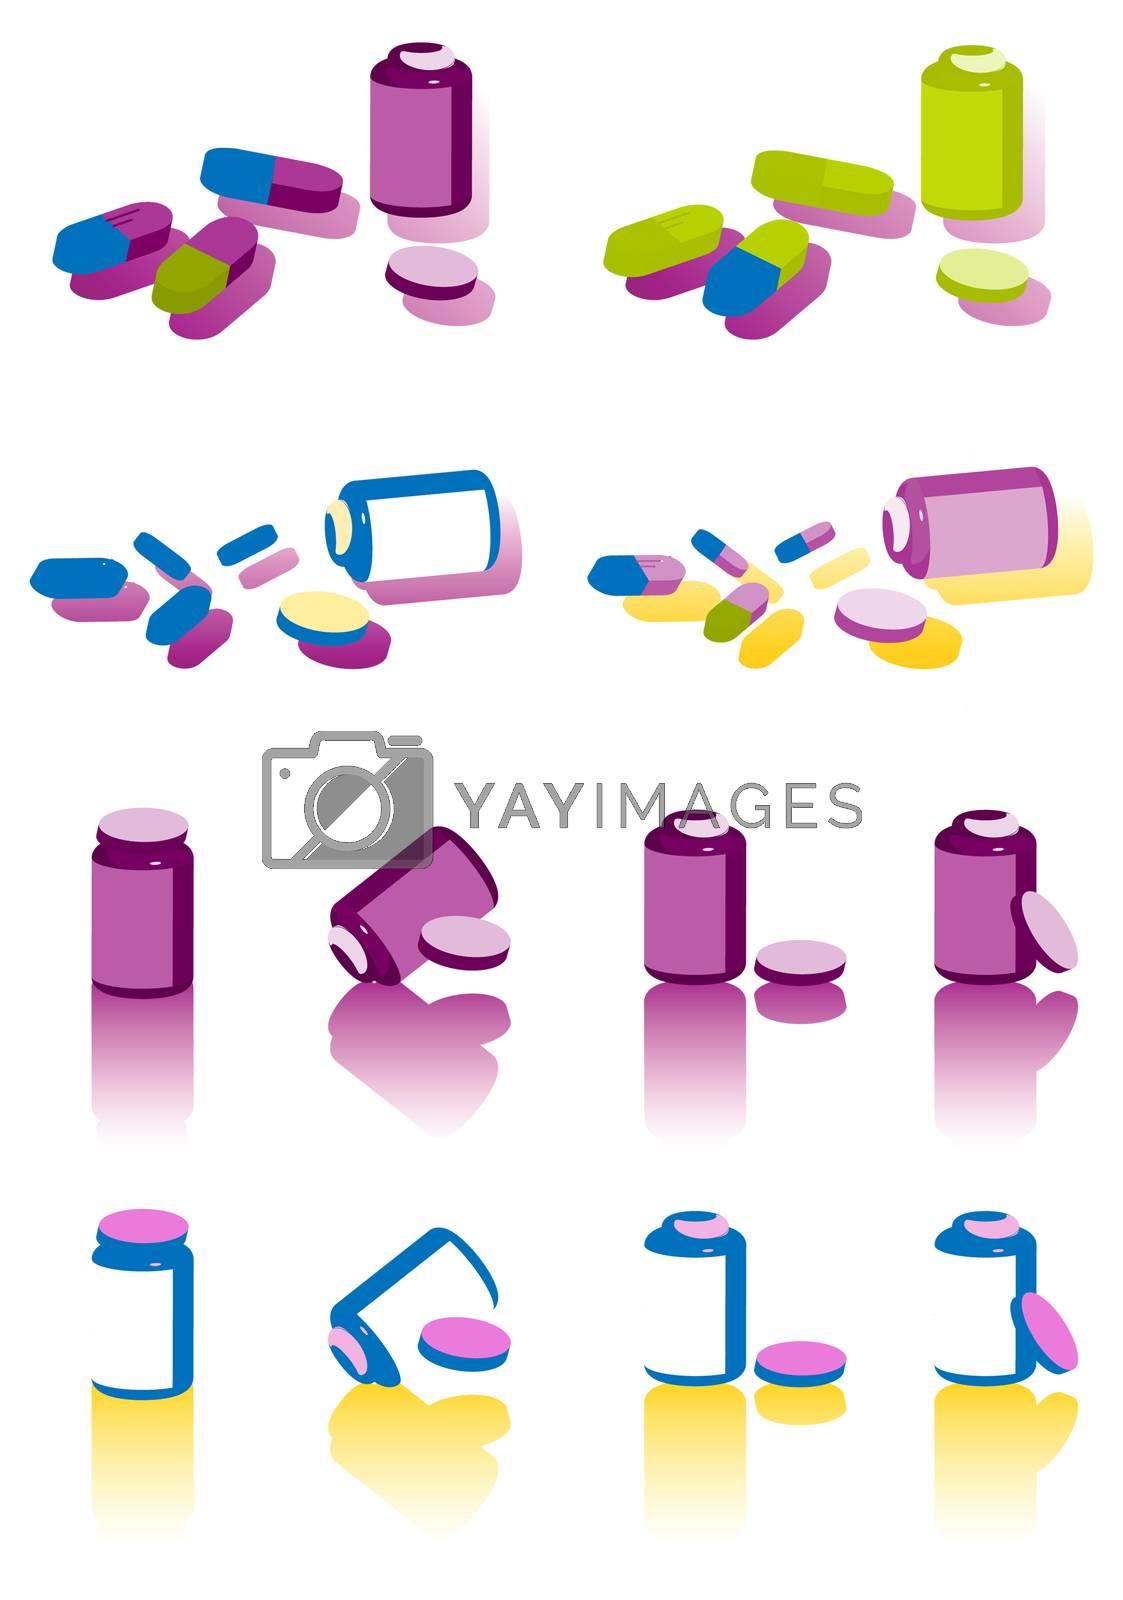 clolor pills on white background icons set, medical illustration